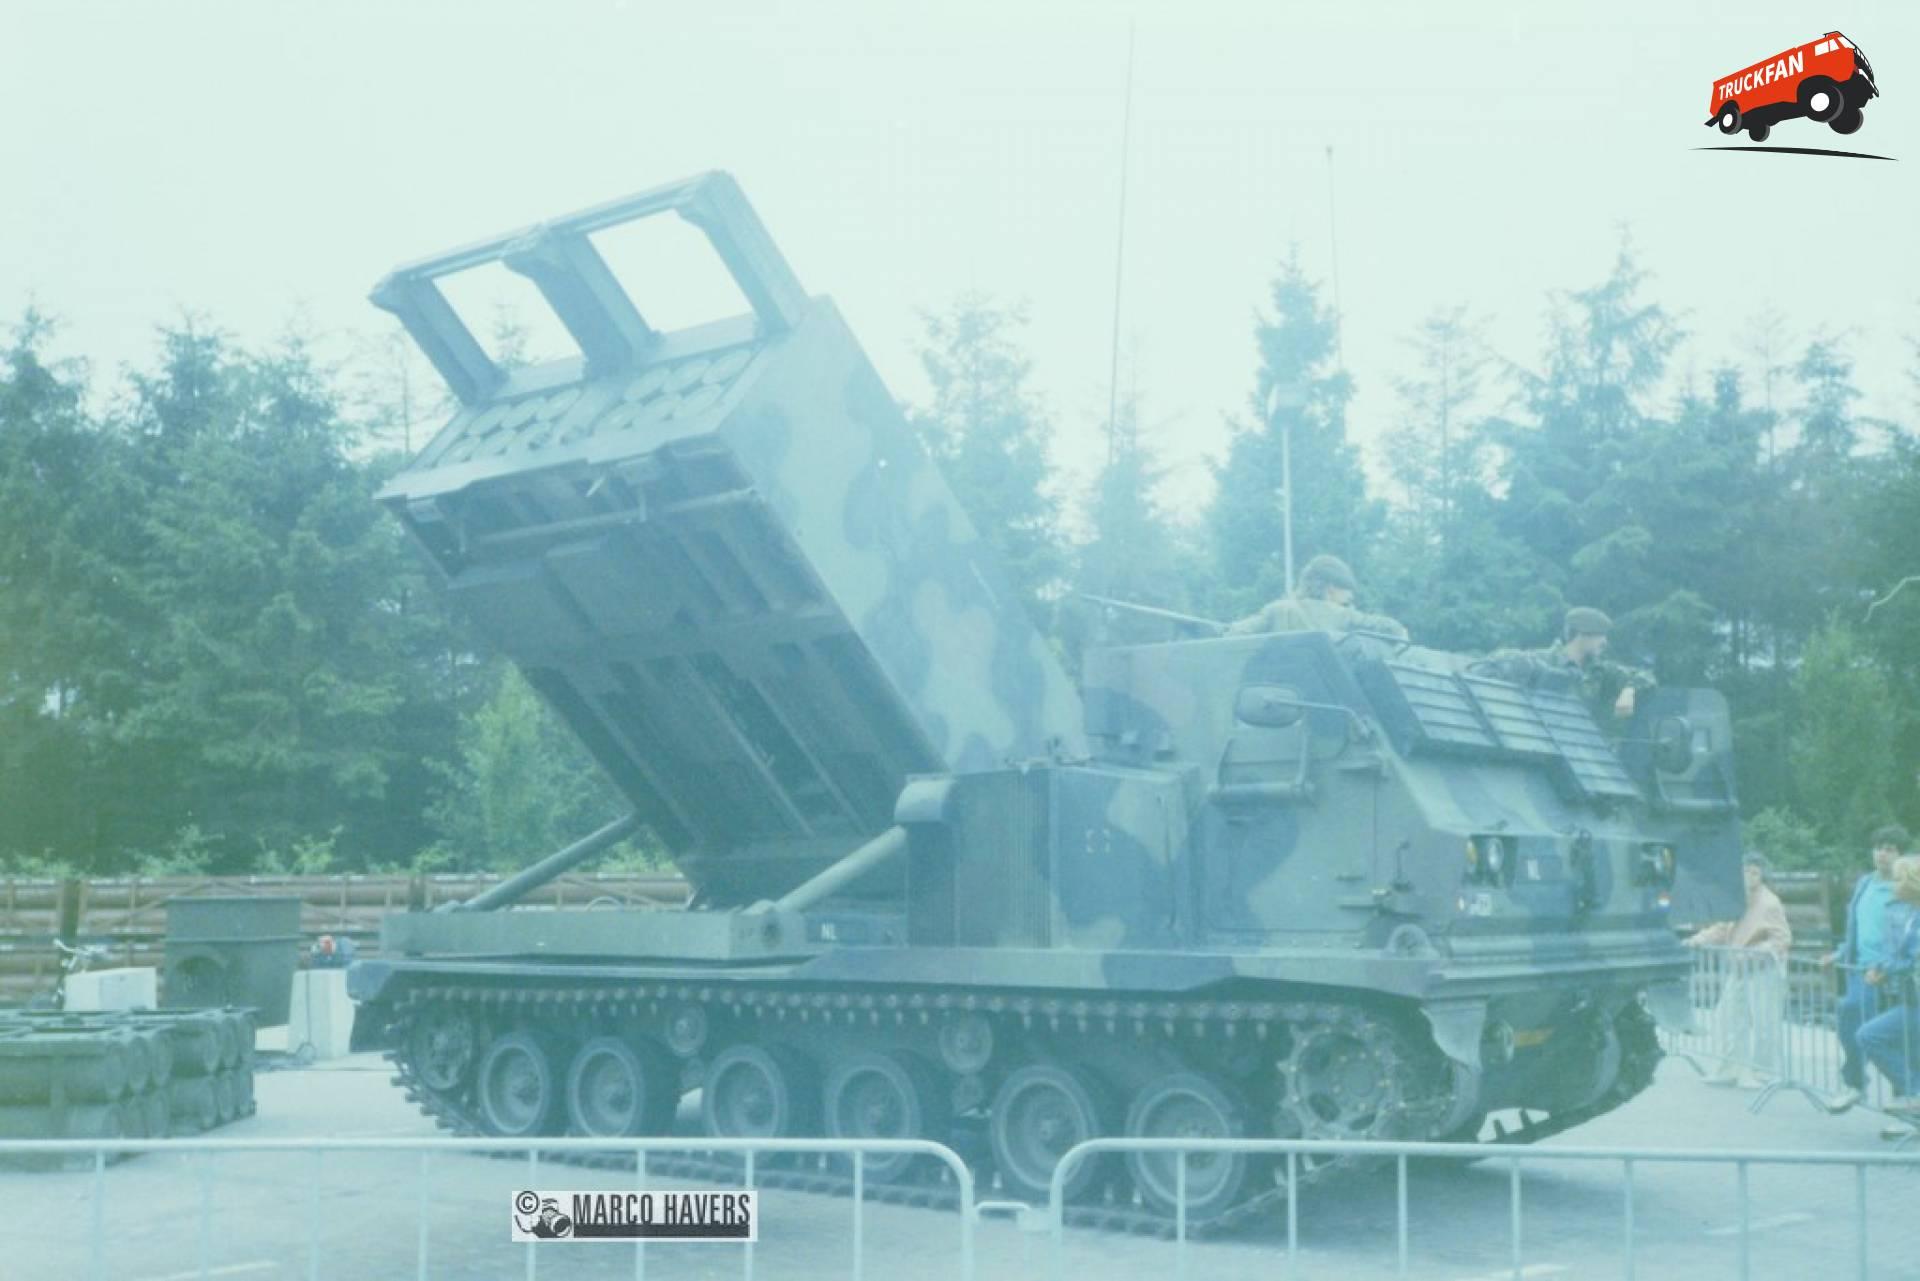 Vought M270 MLRS